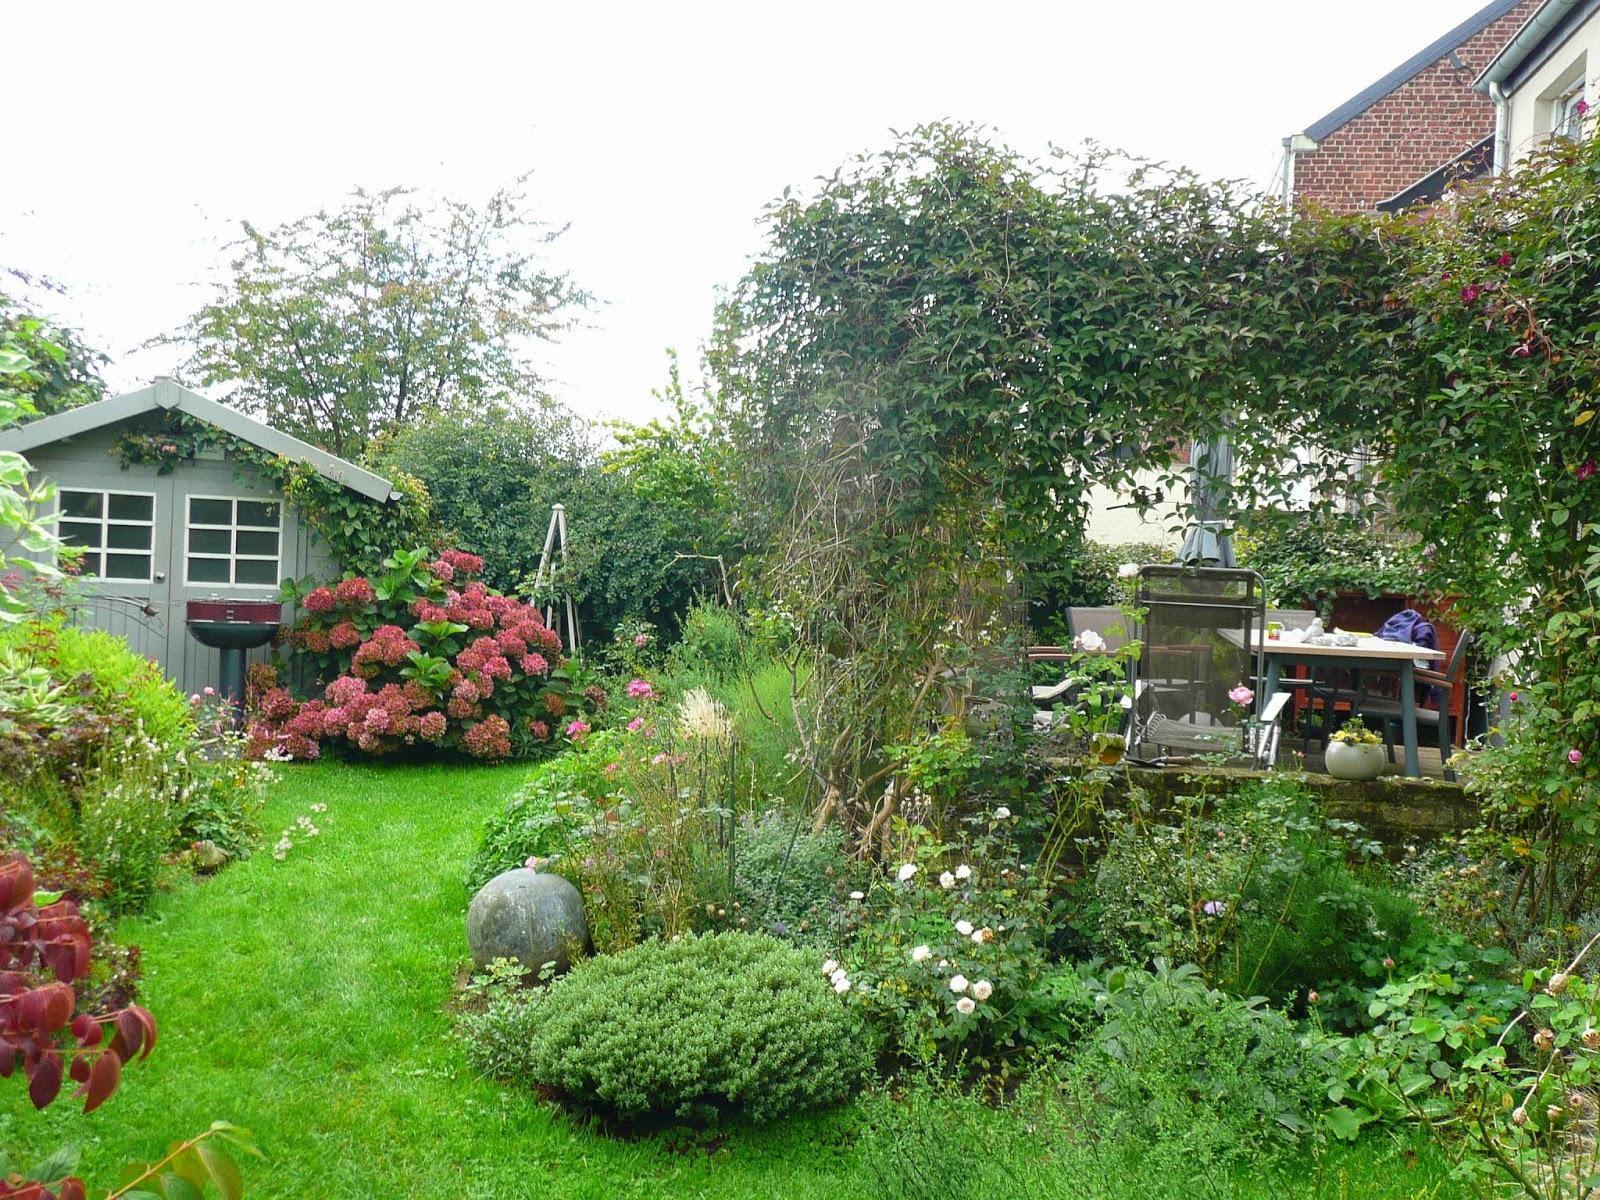 Notre jardin secret week end belge le jardin de malo for Les jardins de lee